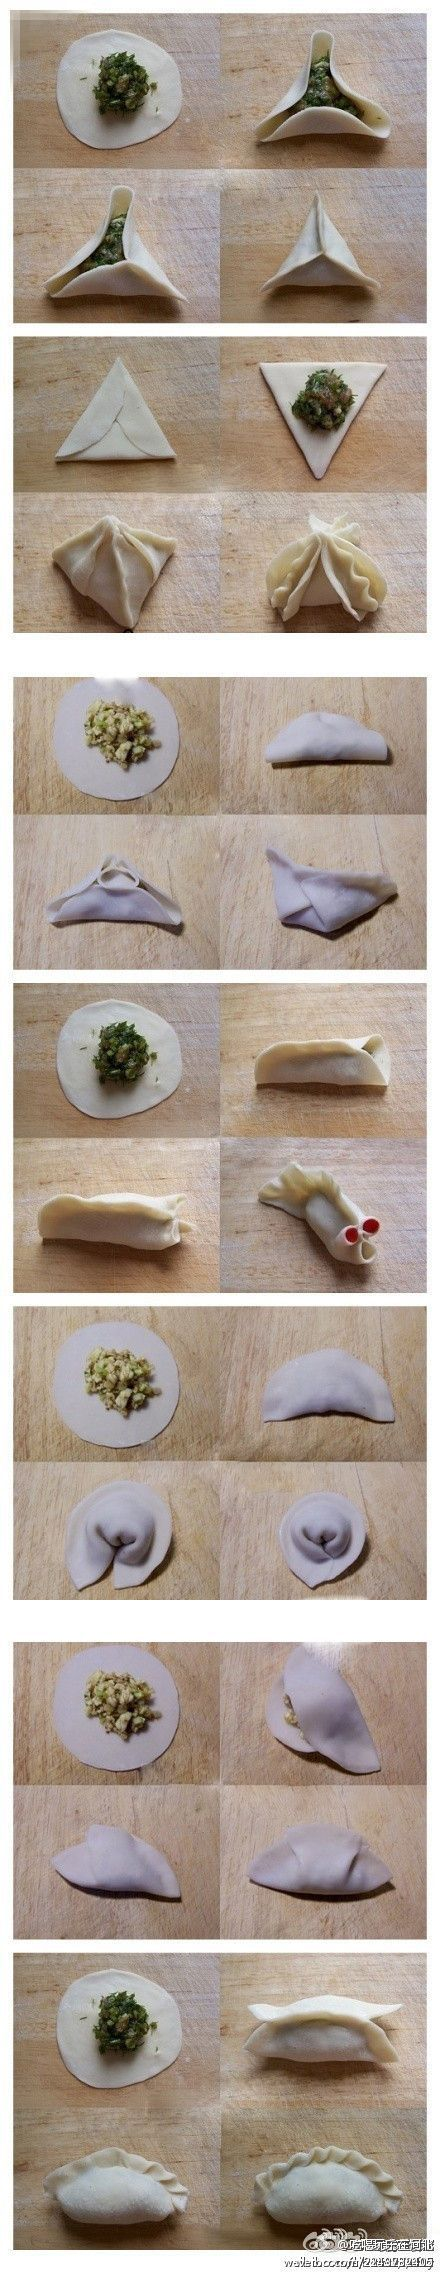 7 ways to fold dumplings. Needed this last night!